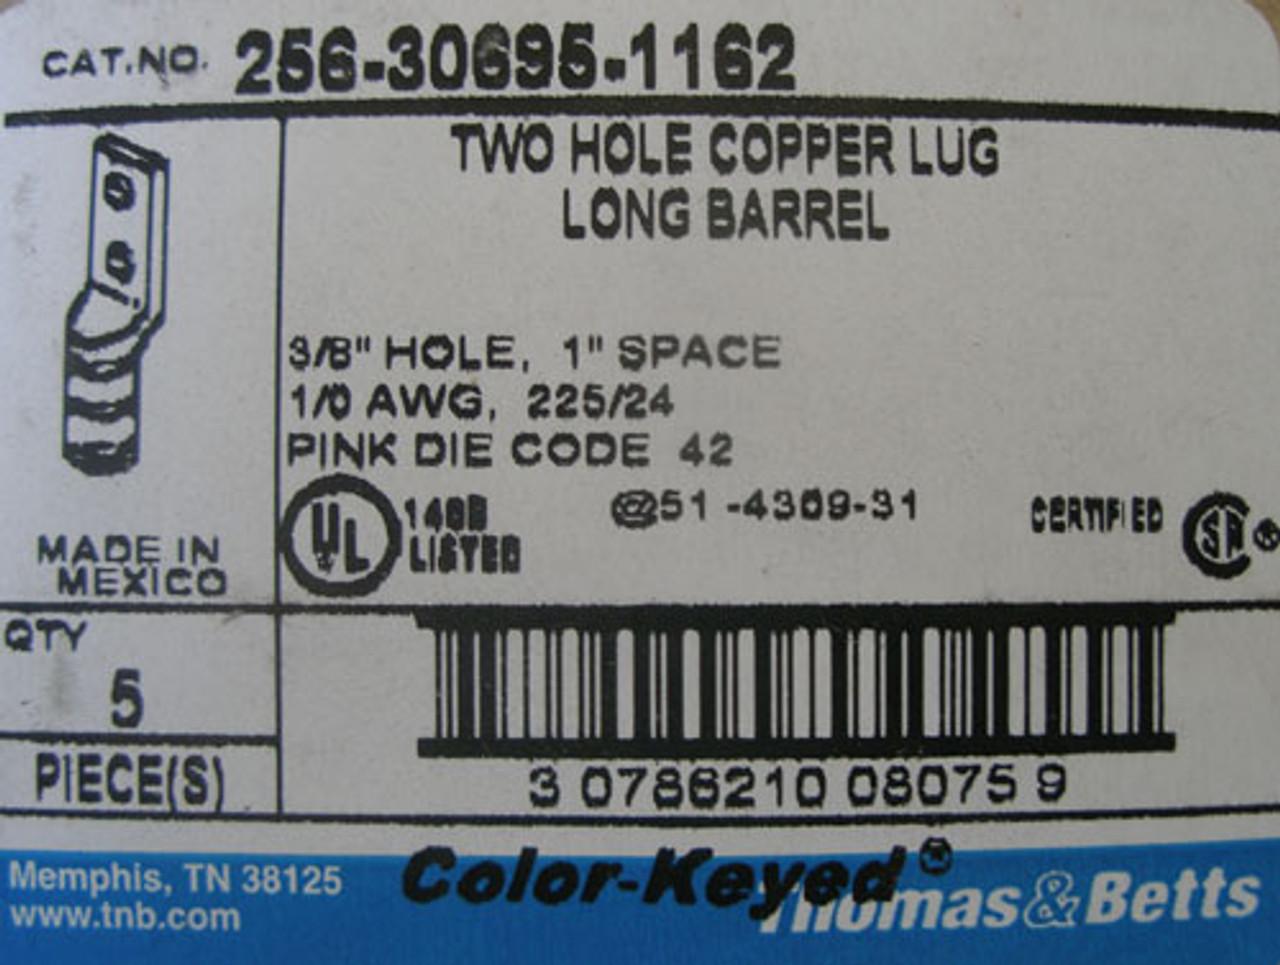 Thomas & Betts 256-30695-1162 2 Hole Long Barrel Copper Lug, Lot of 5 - New